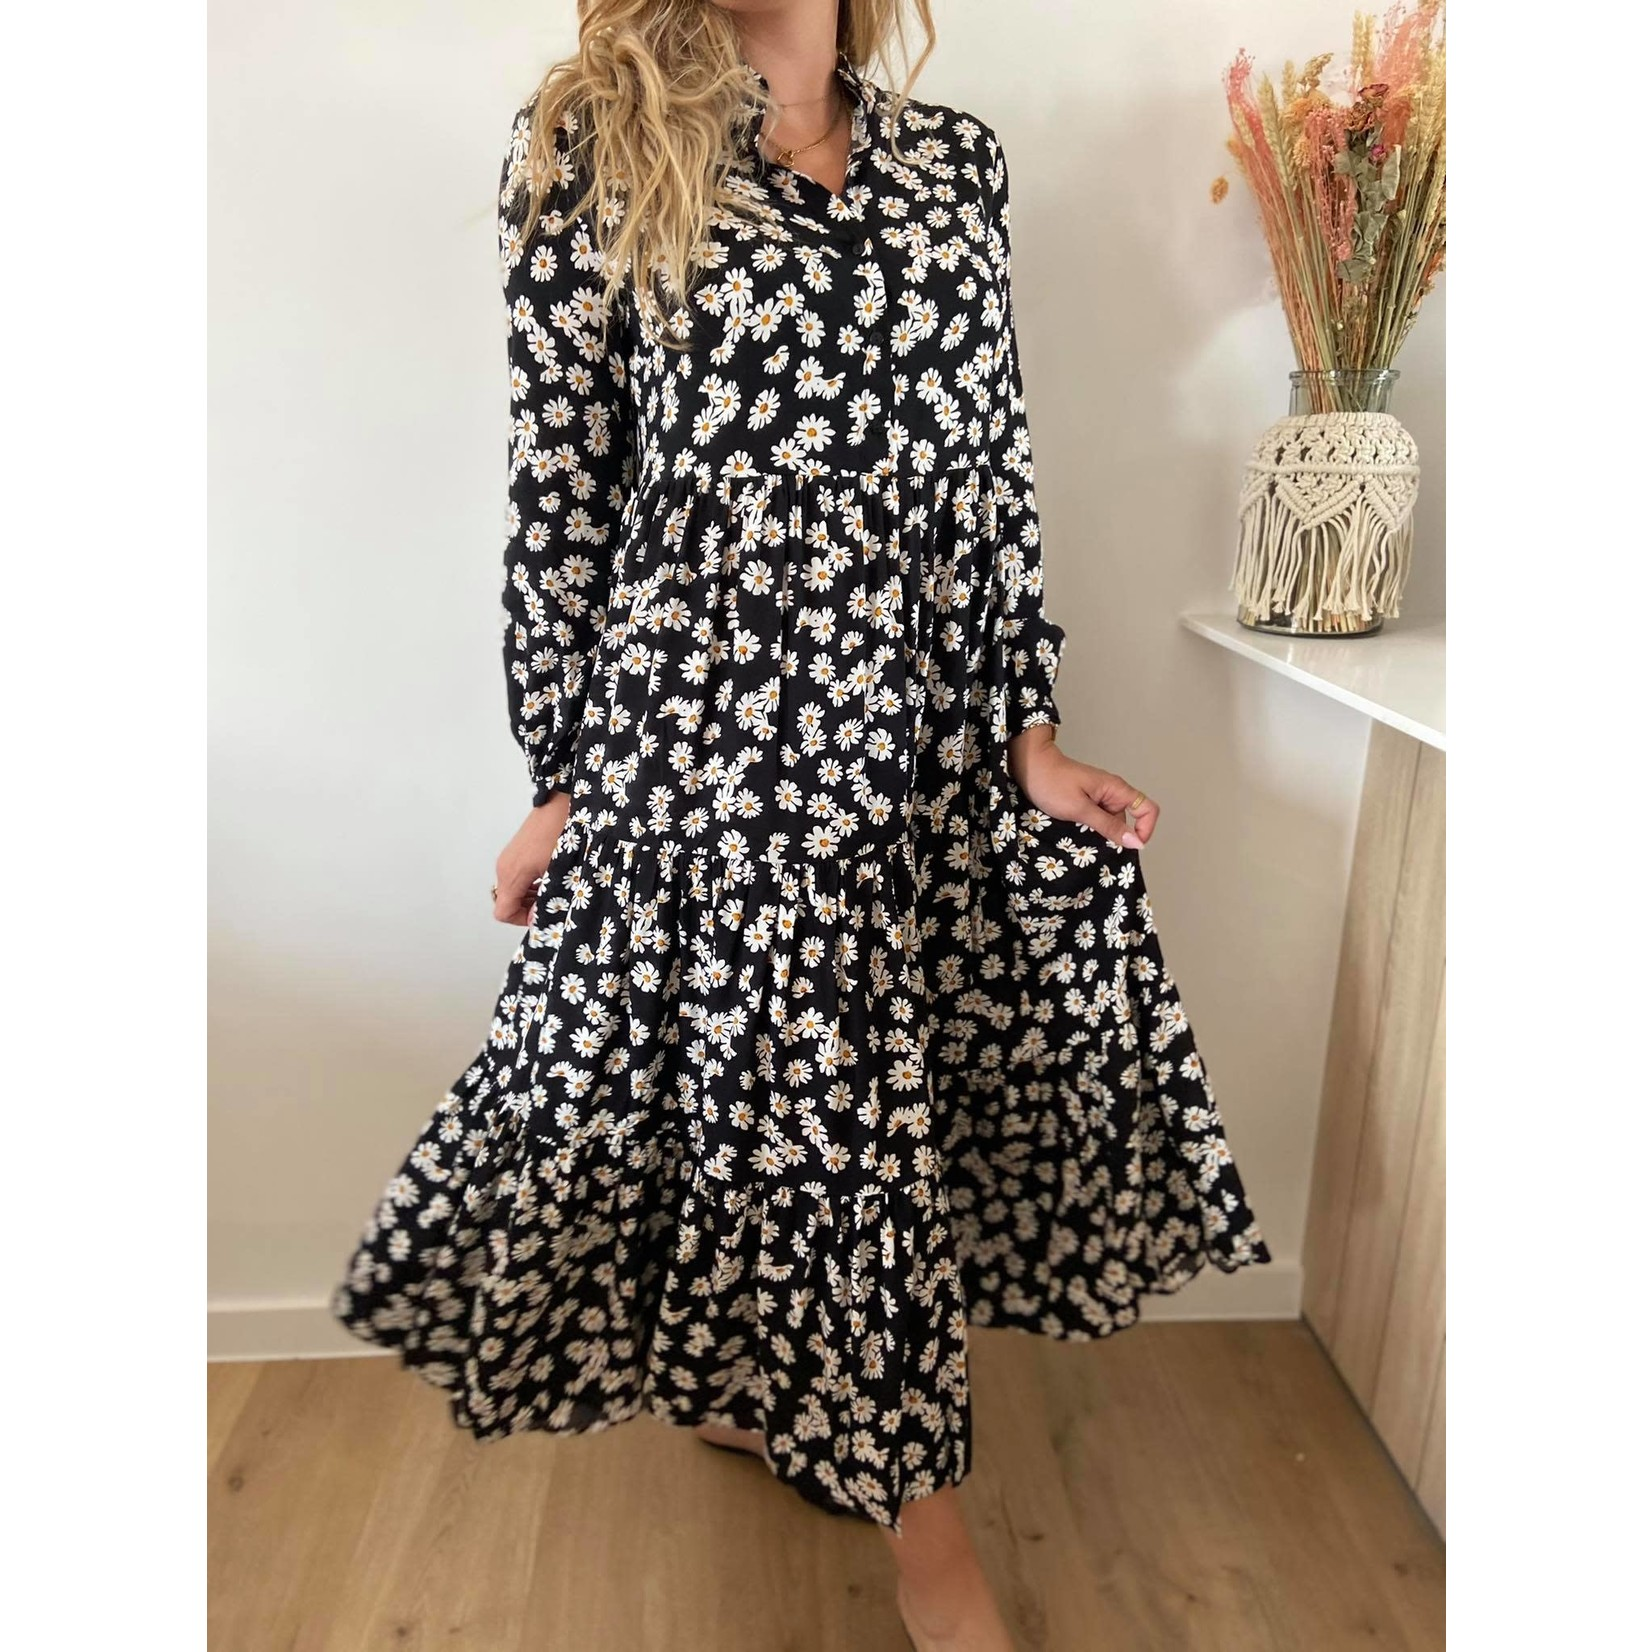 Sano black flower dress